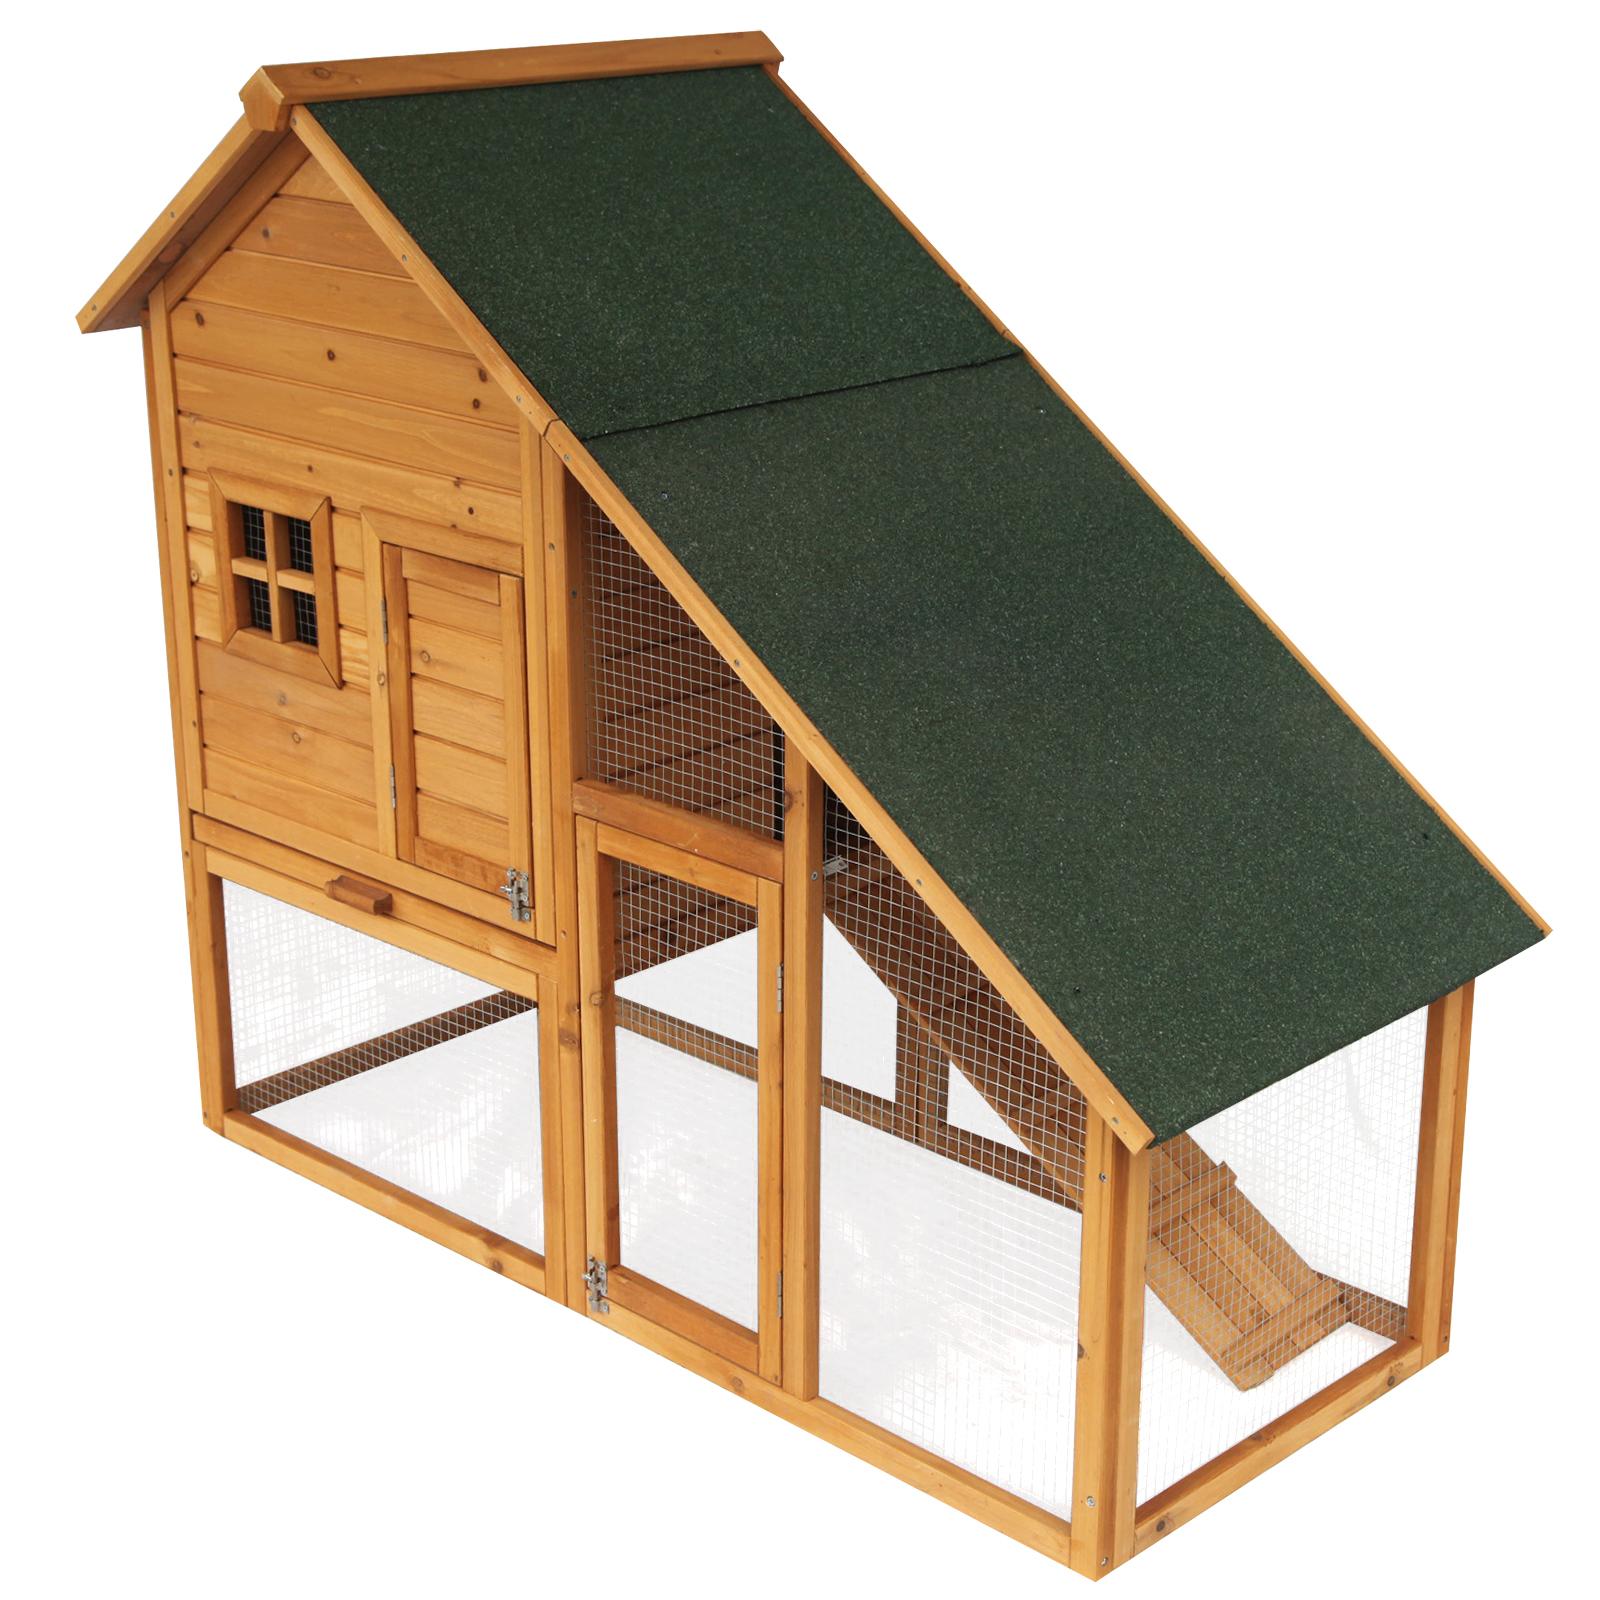 hasenstall kaninchenstall kleintierstall holz 2 st ckig. Black Bedroom Furniture Sets. Home Design Ideas